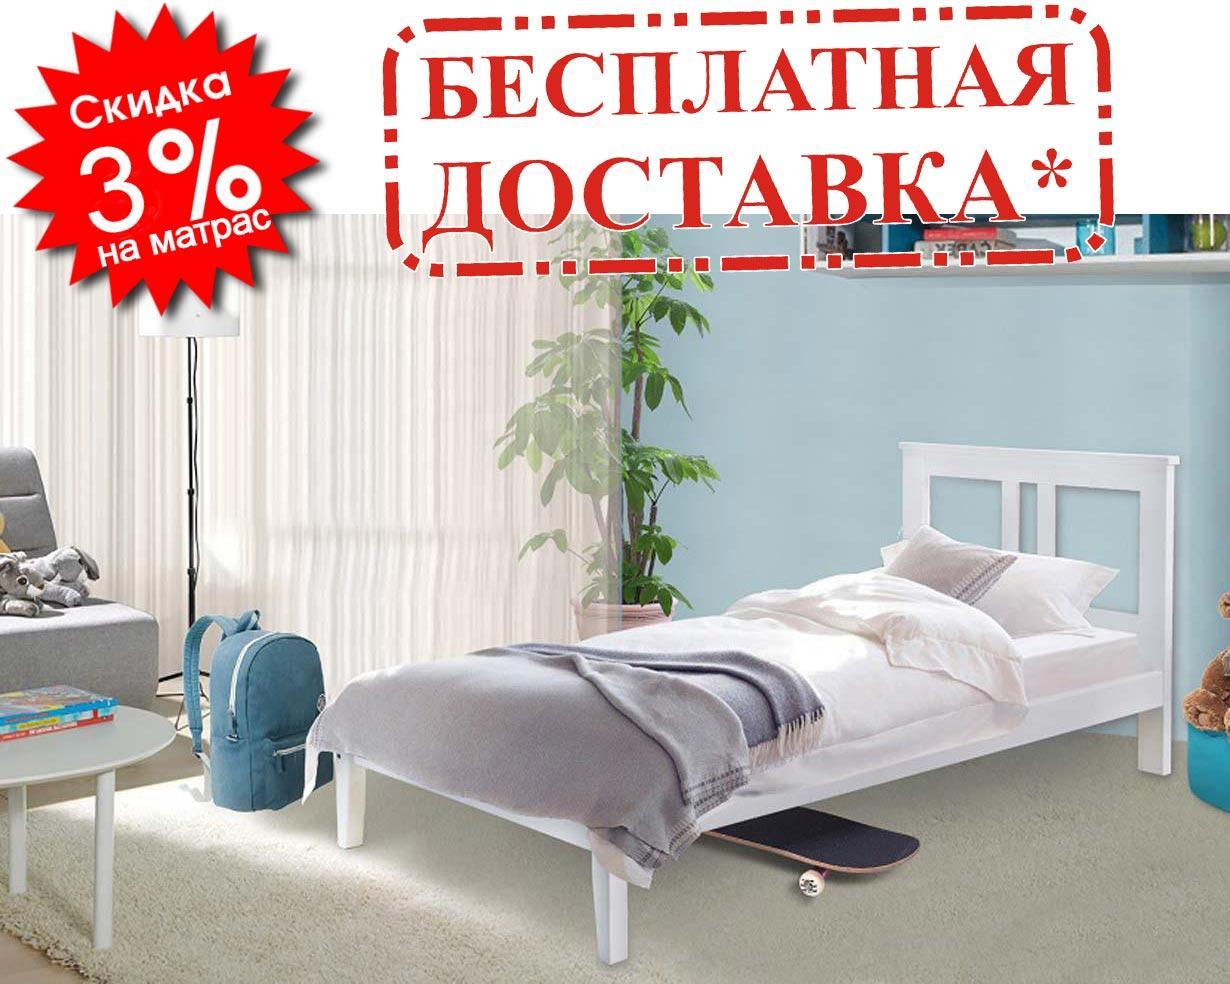 👪Деревянная кровать Бесси 80х190 см ТМ Mr.Mebl